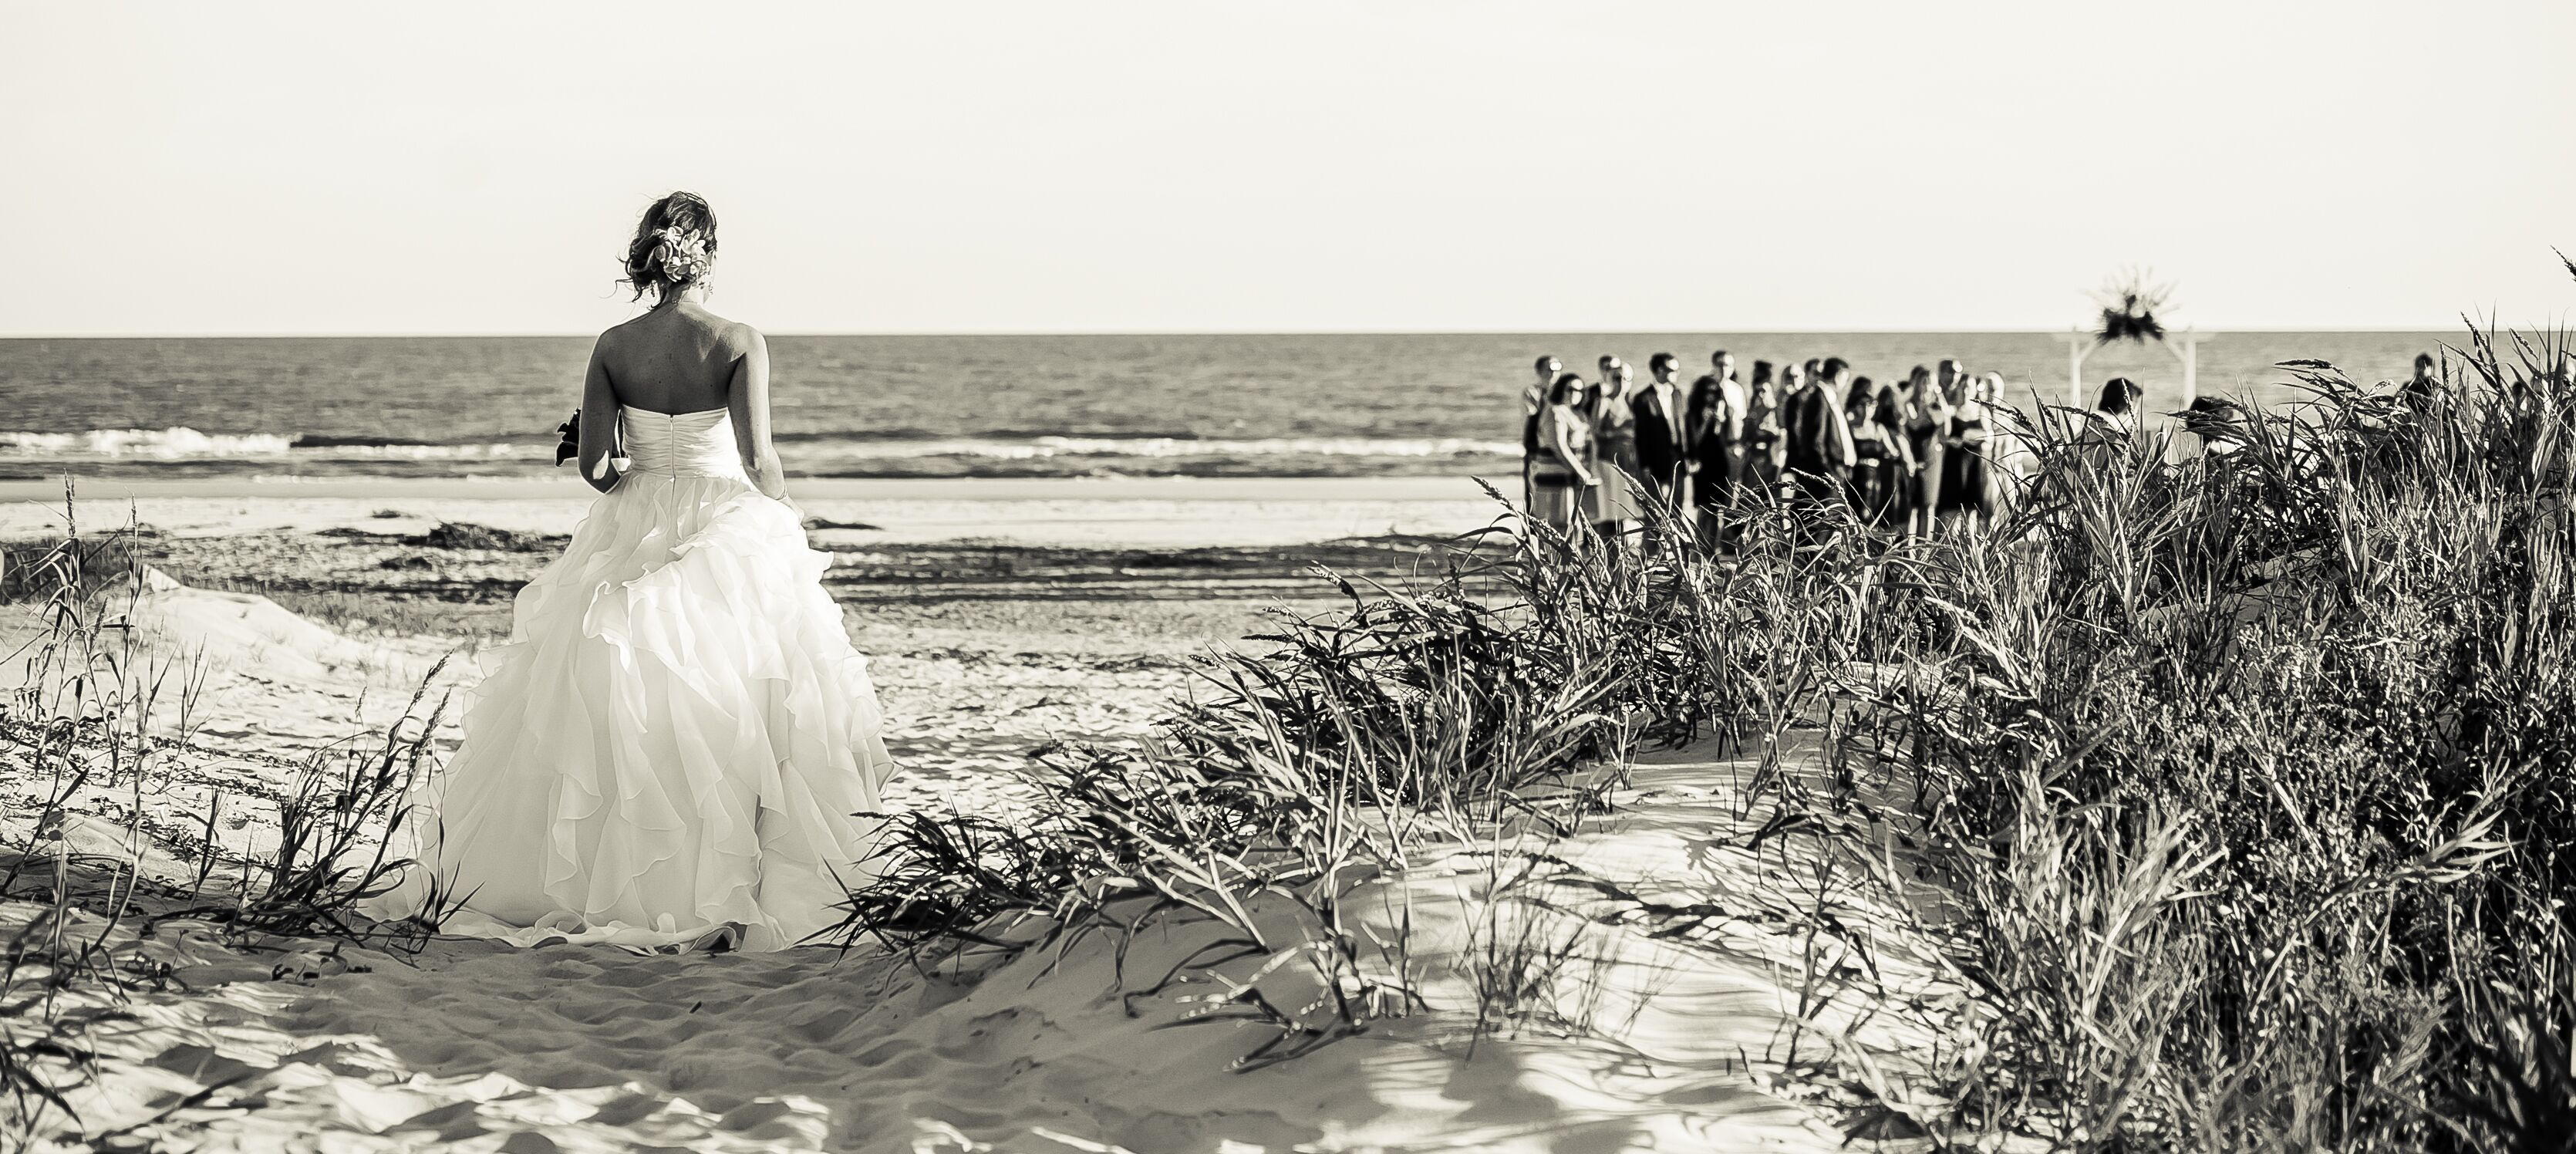 Beachside J.Crew Wedding Dress